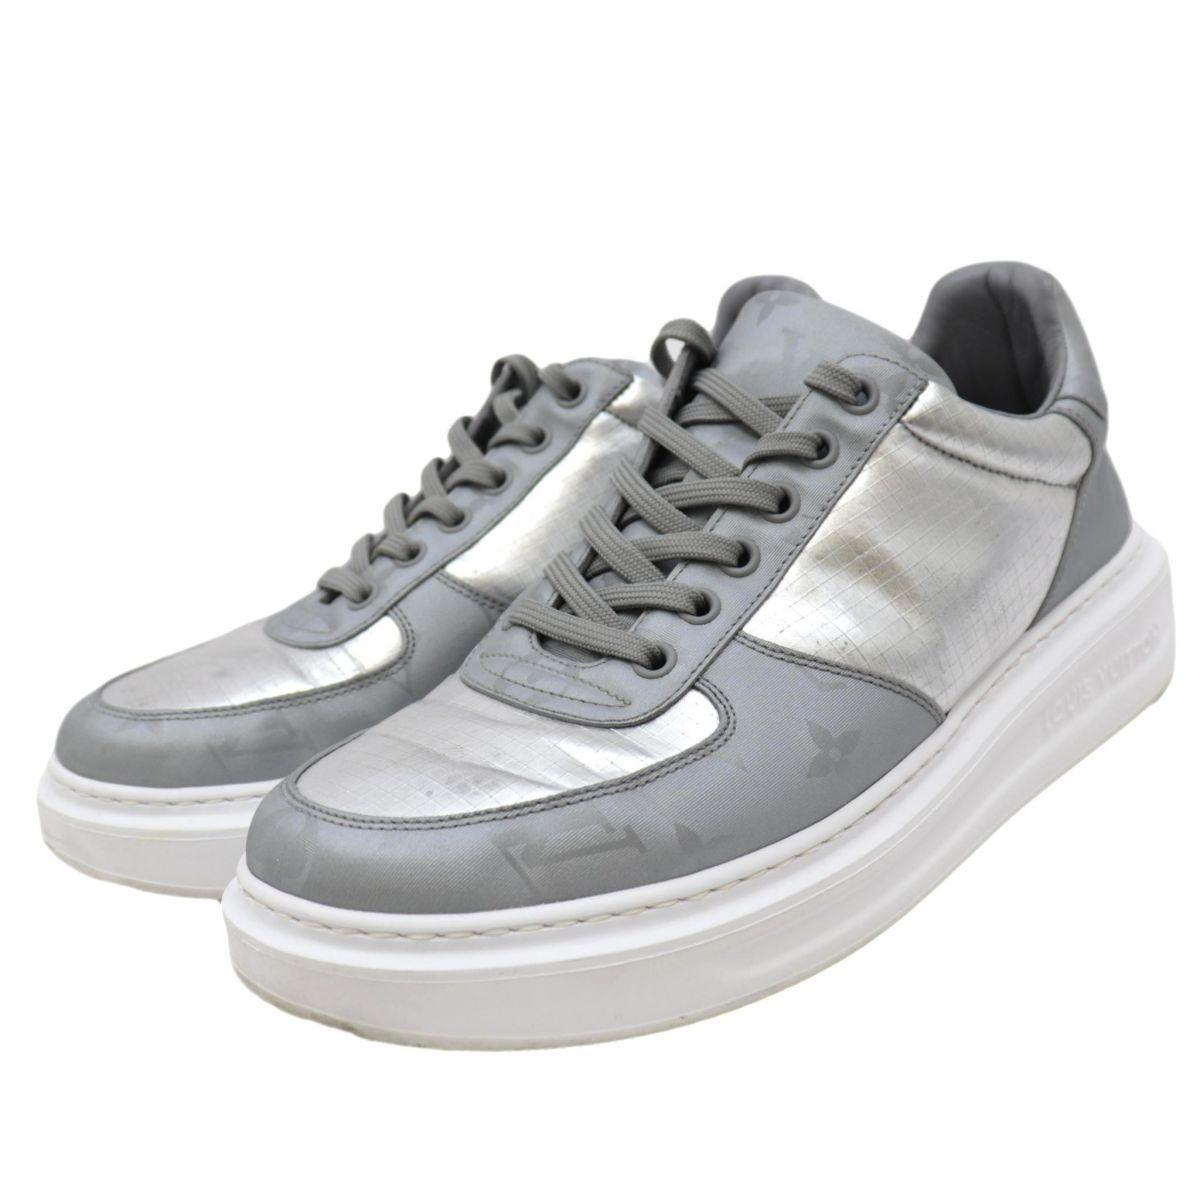 Louis Vuitton 18 Years Monogram Metallic Leather Sneakers Mens Silver 5.5 Low Cut